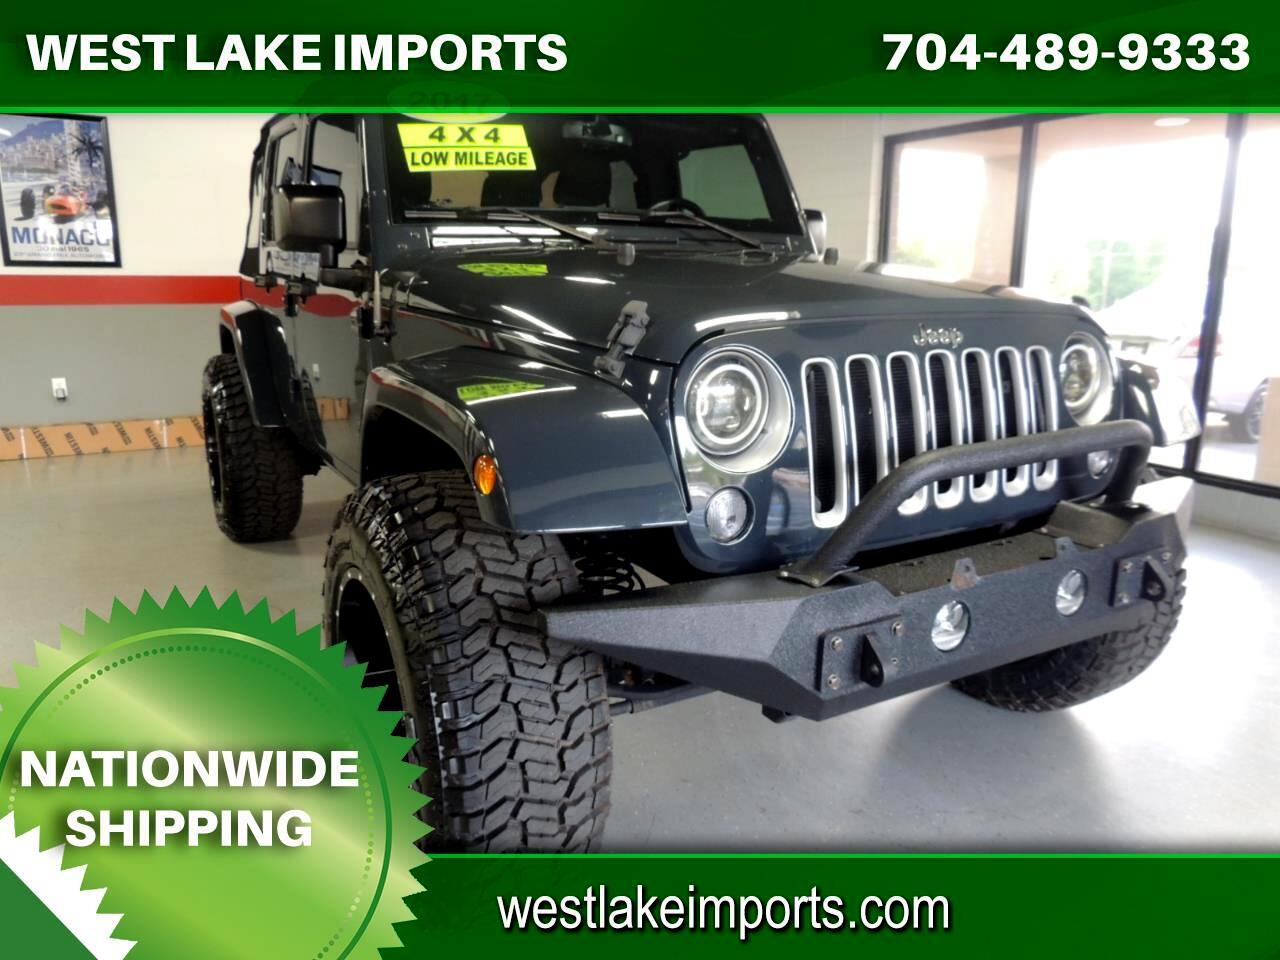 Jeep Wrangler Unlimited Sahara 4x4 2017